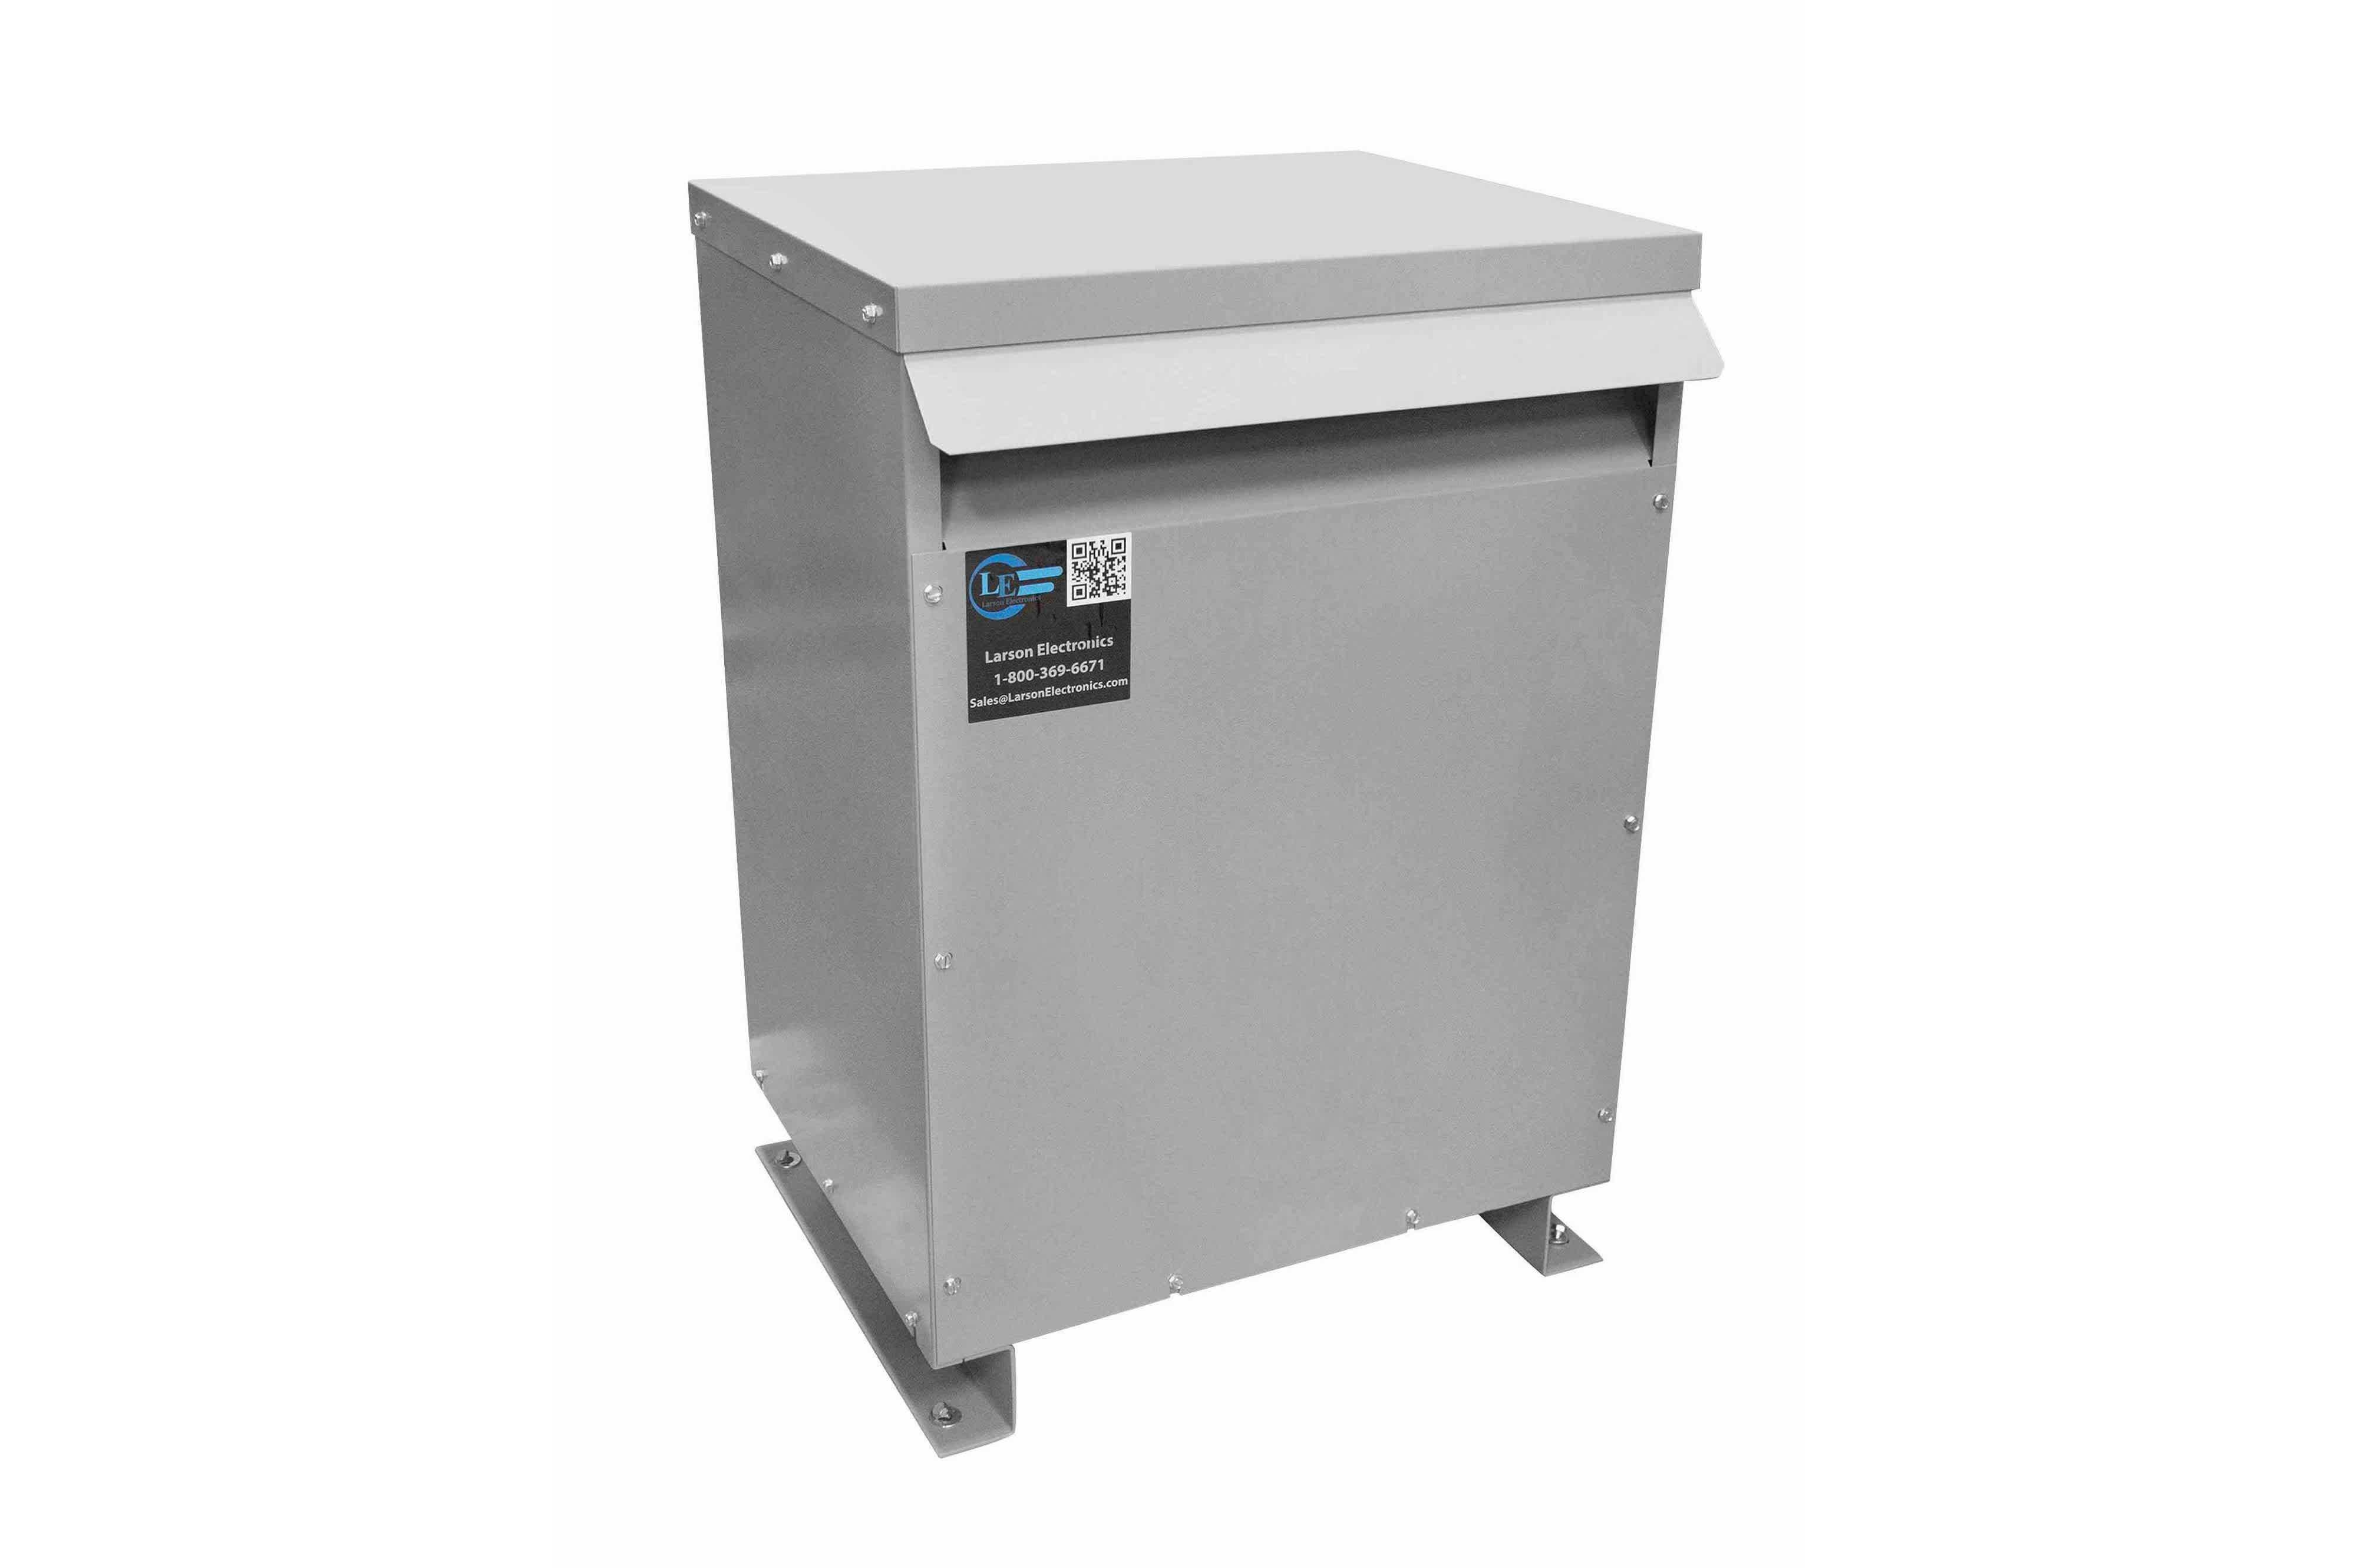 175 kVA 3PH Isolation Transformer, 400V Wye Primary, 480Y/277 Wye-N Secondary, N3R, Ventilated, 60 Hz